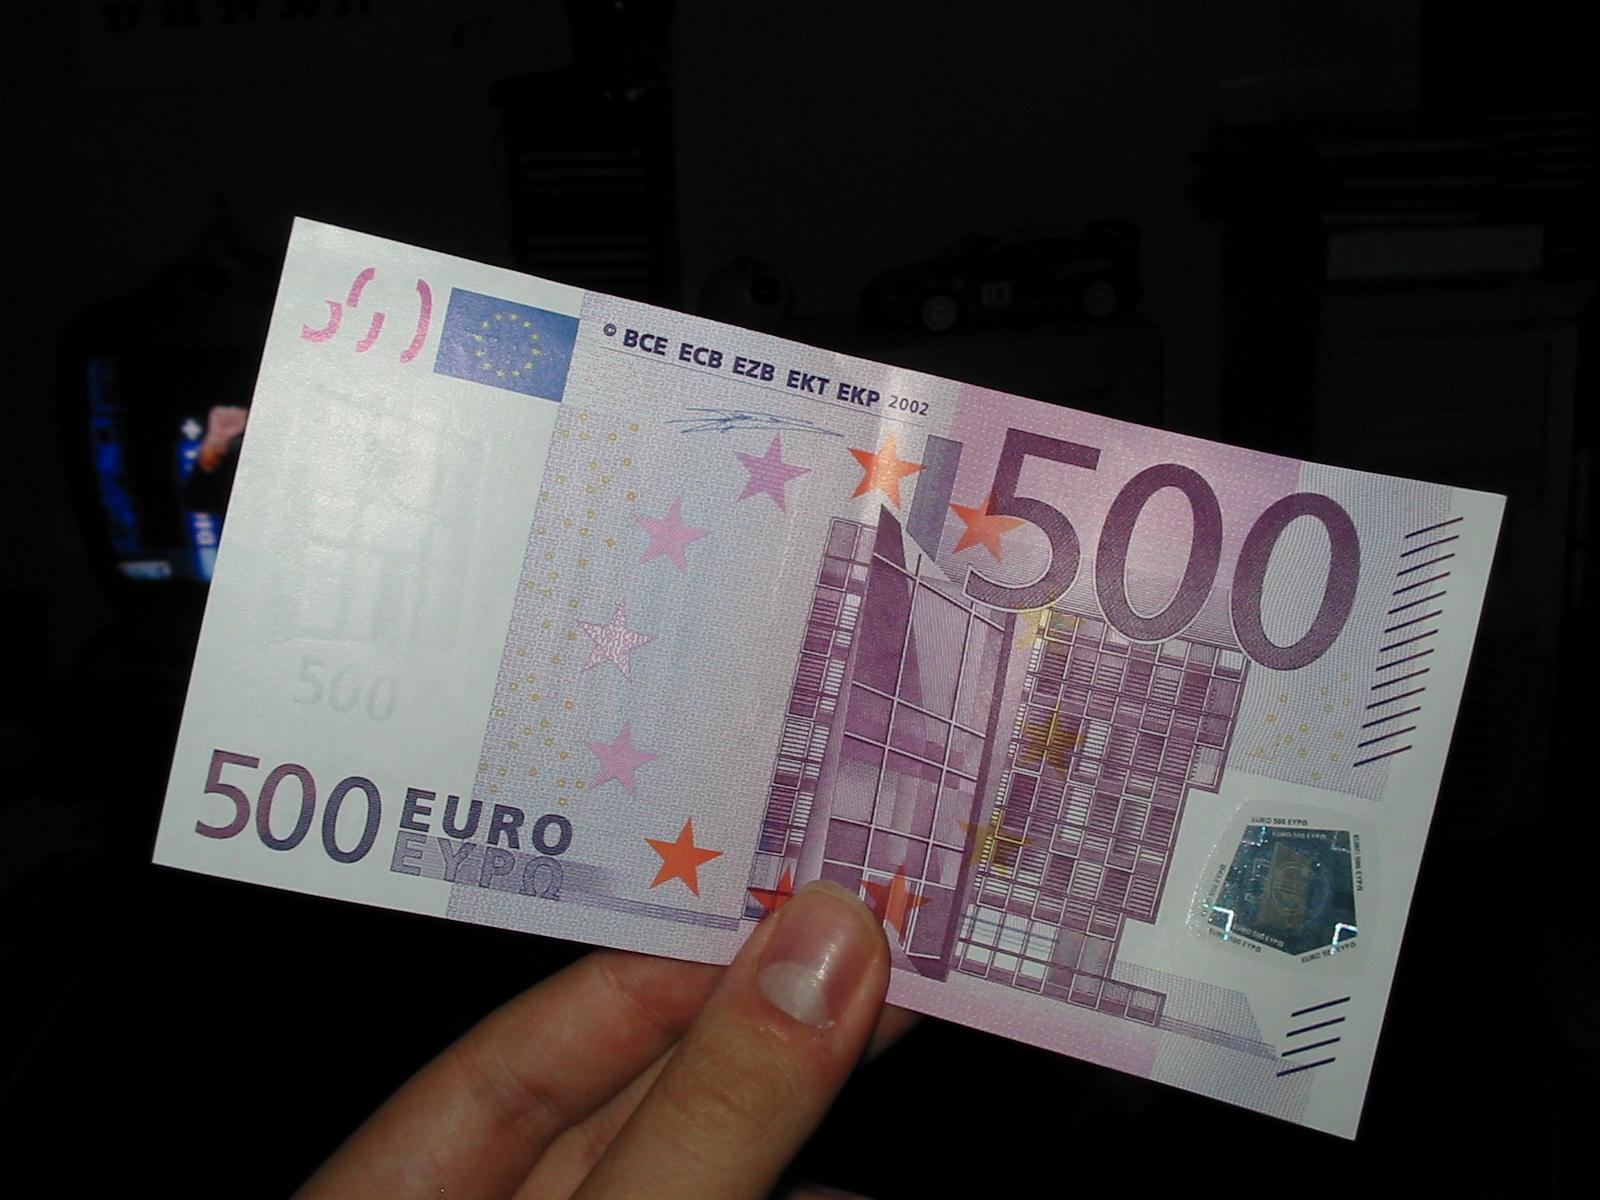 soldi subito online shop